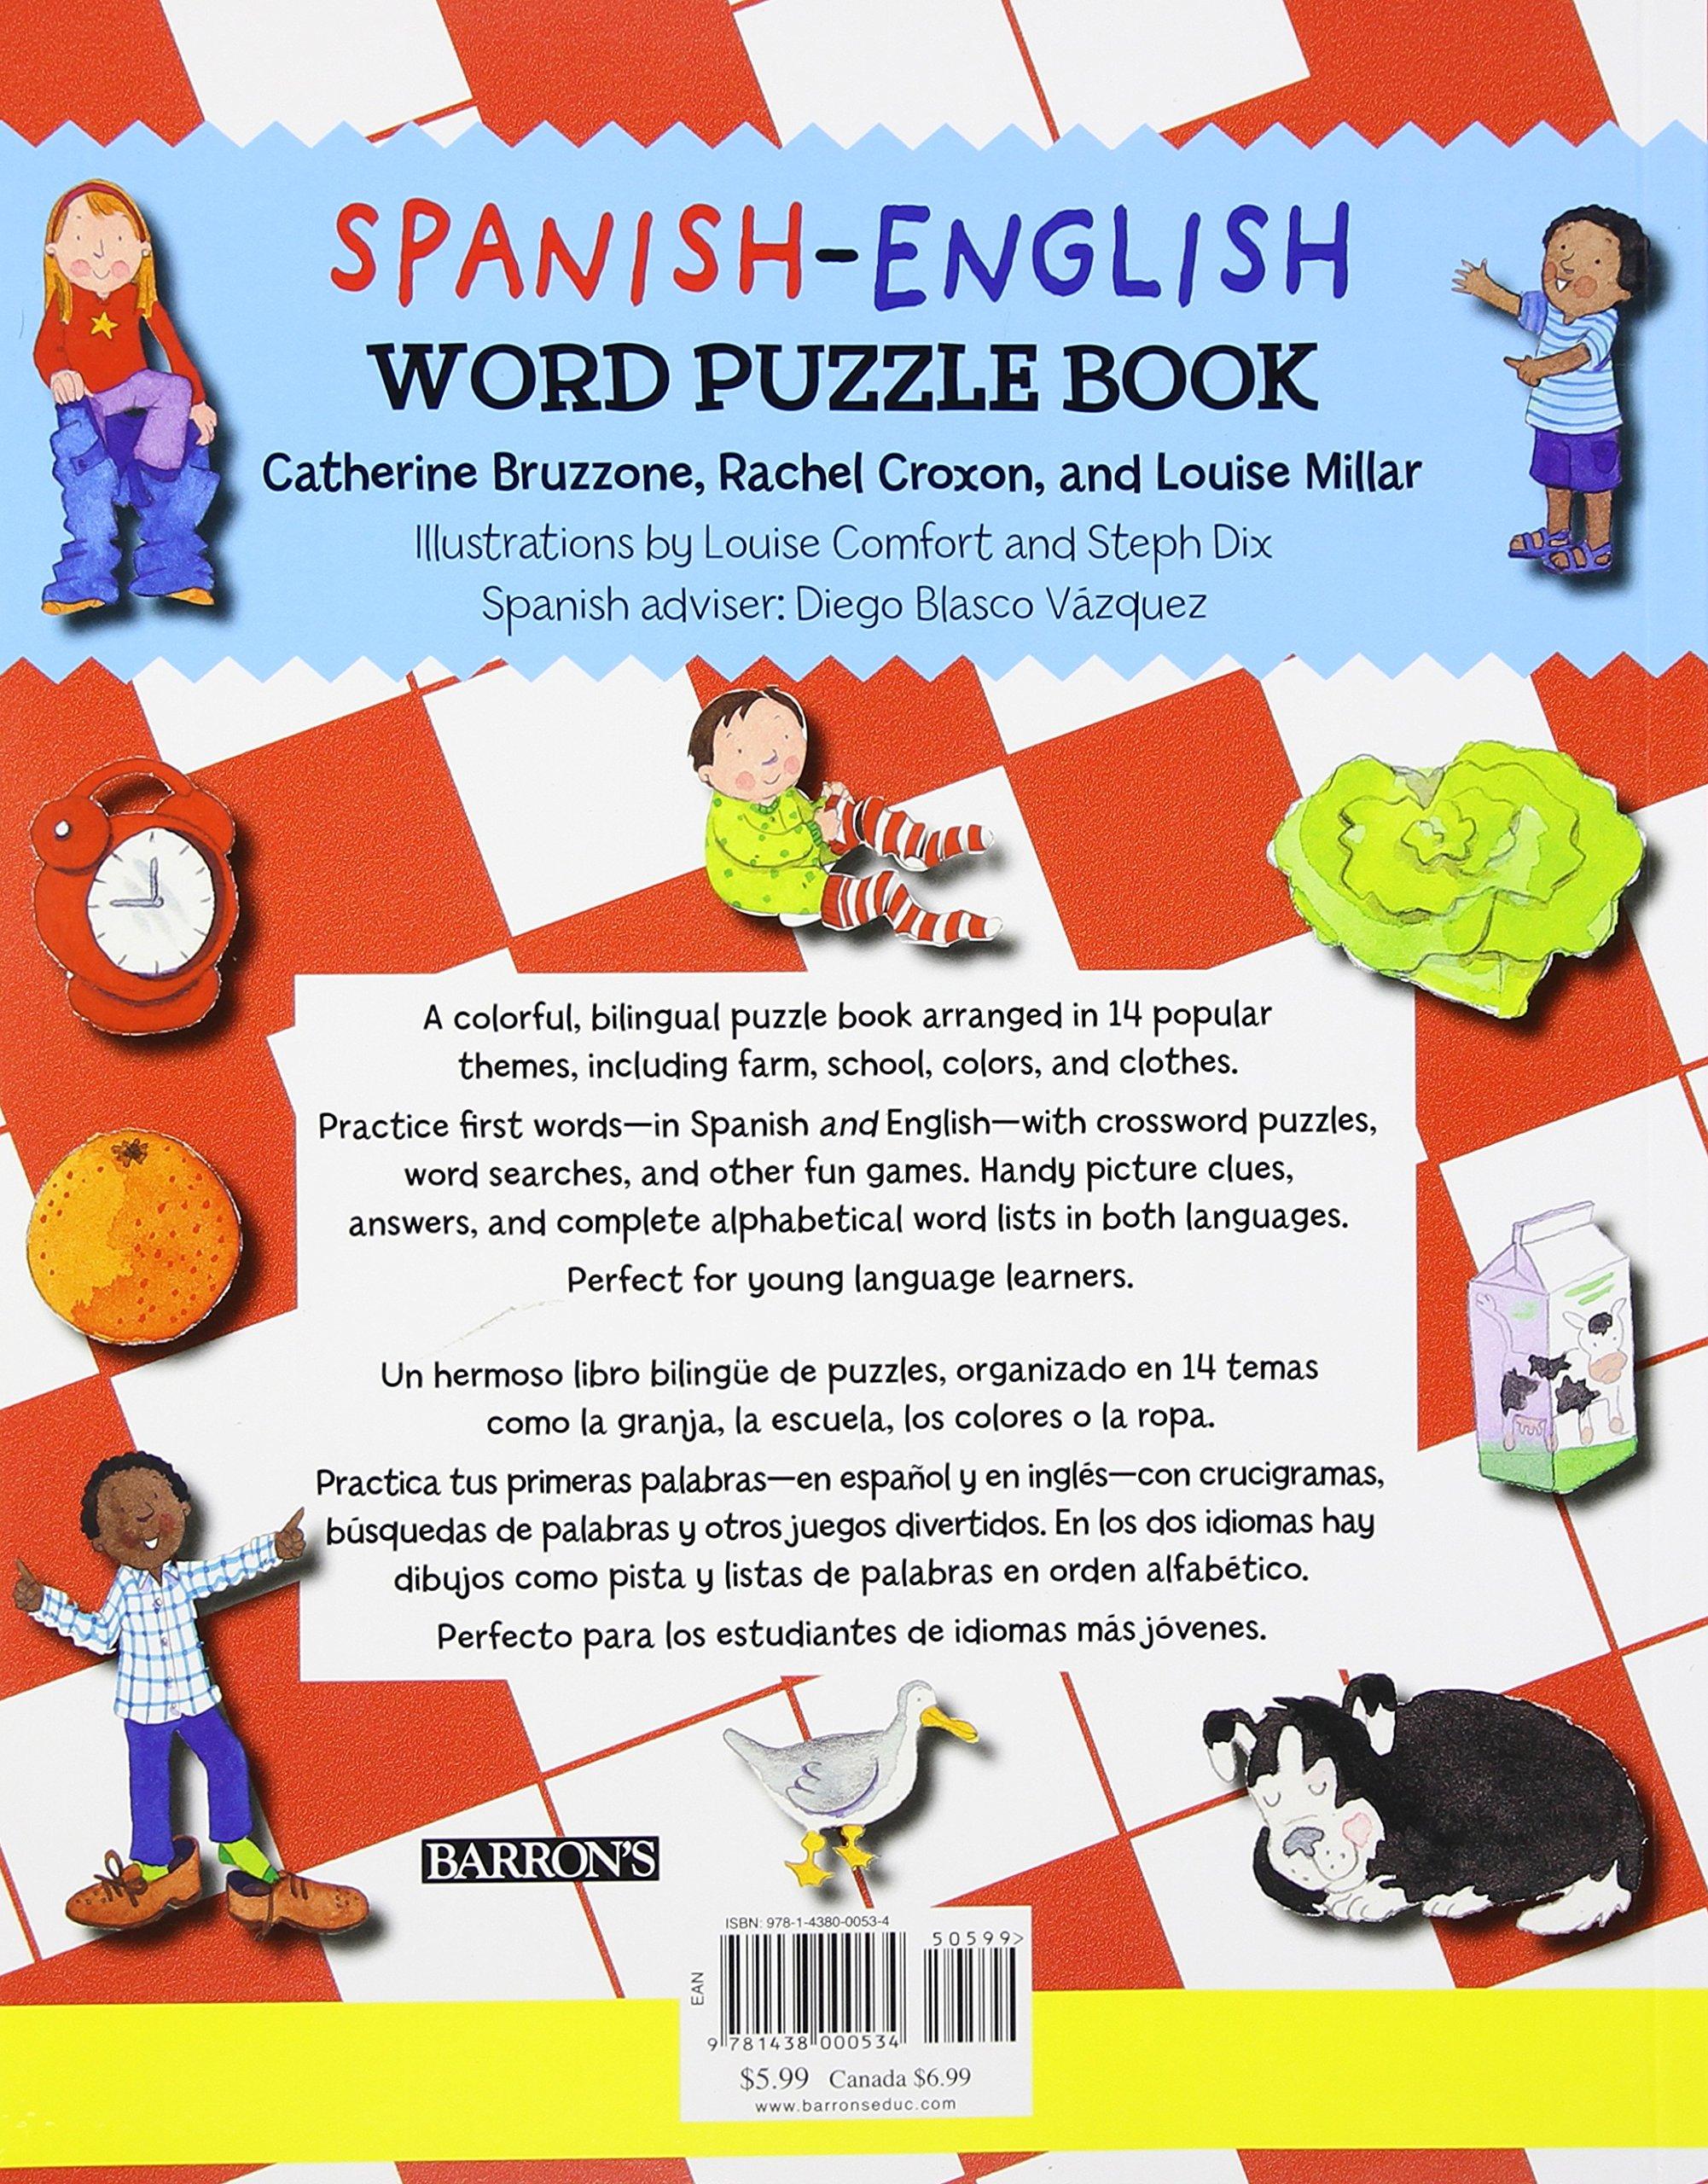 Spanish-English Word Puzzle Book: 14 Fun Spanish and English Word Games (Bilingual Word Puzzle Books) (Spanish Edition)